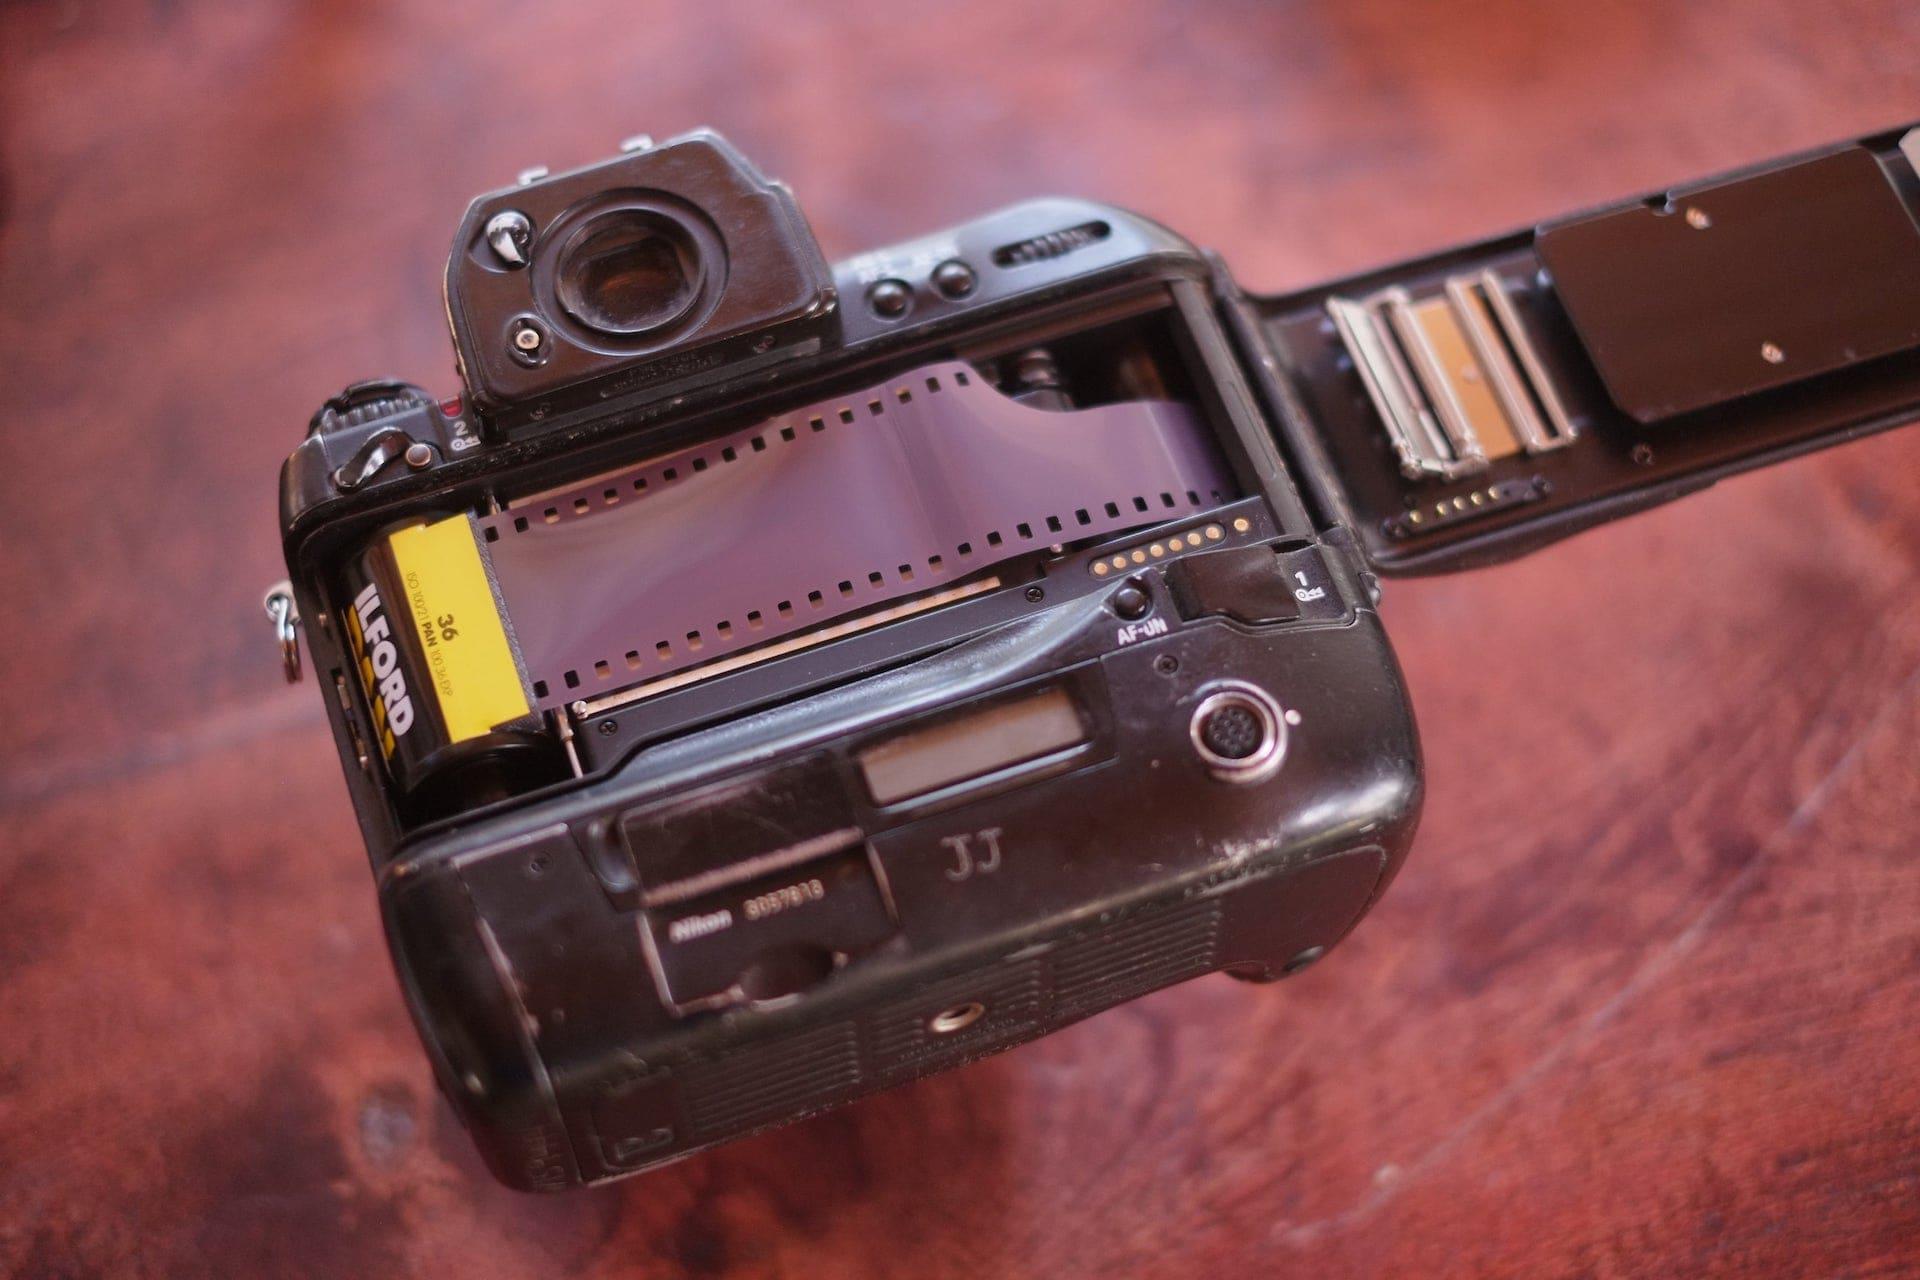 Nikon F5 changing film